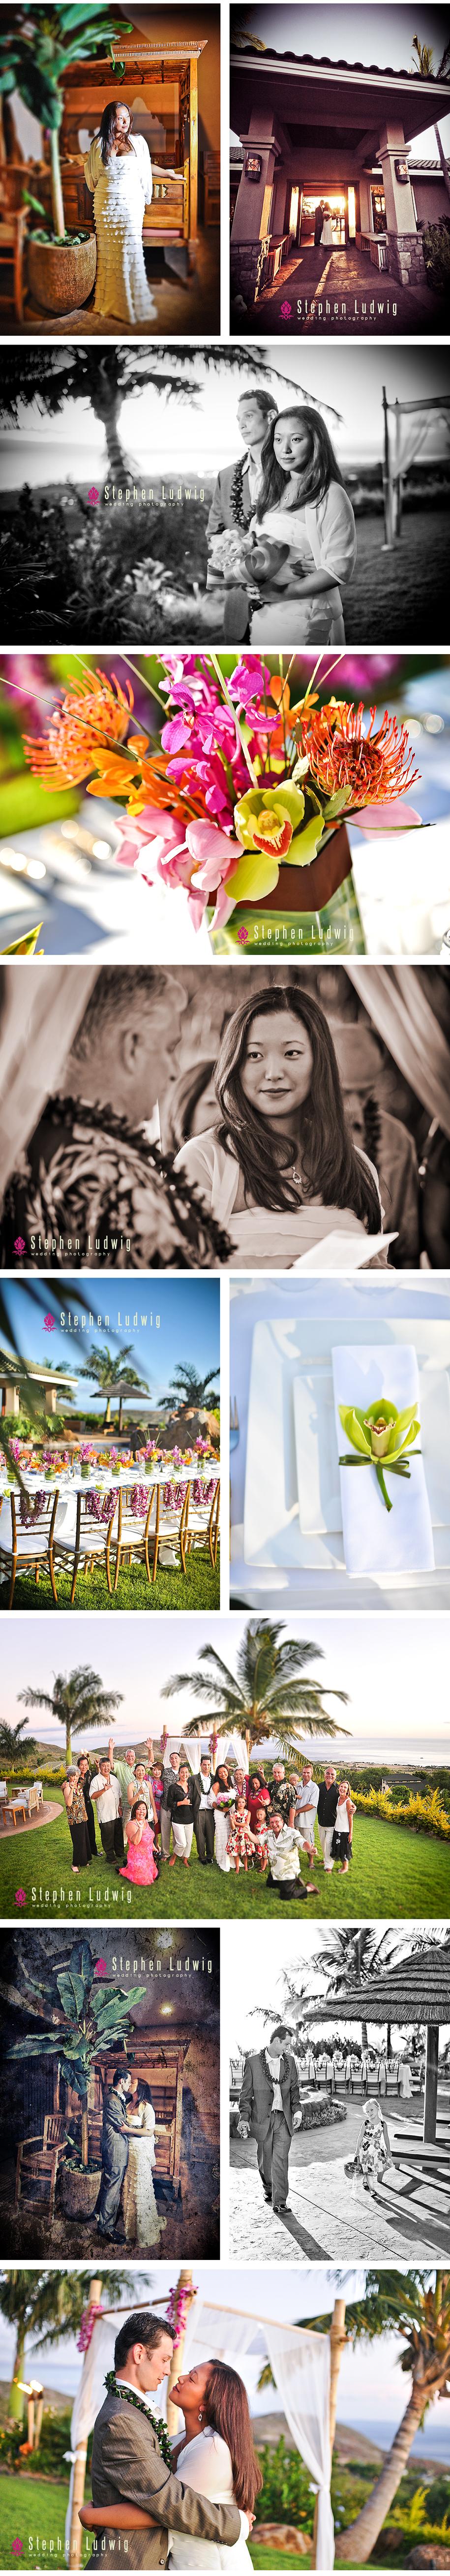 stephen-ludwig-photography-scott-and-lila-wedding-2